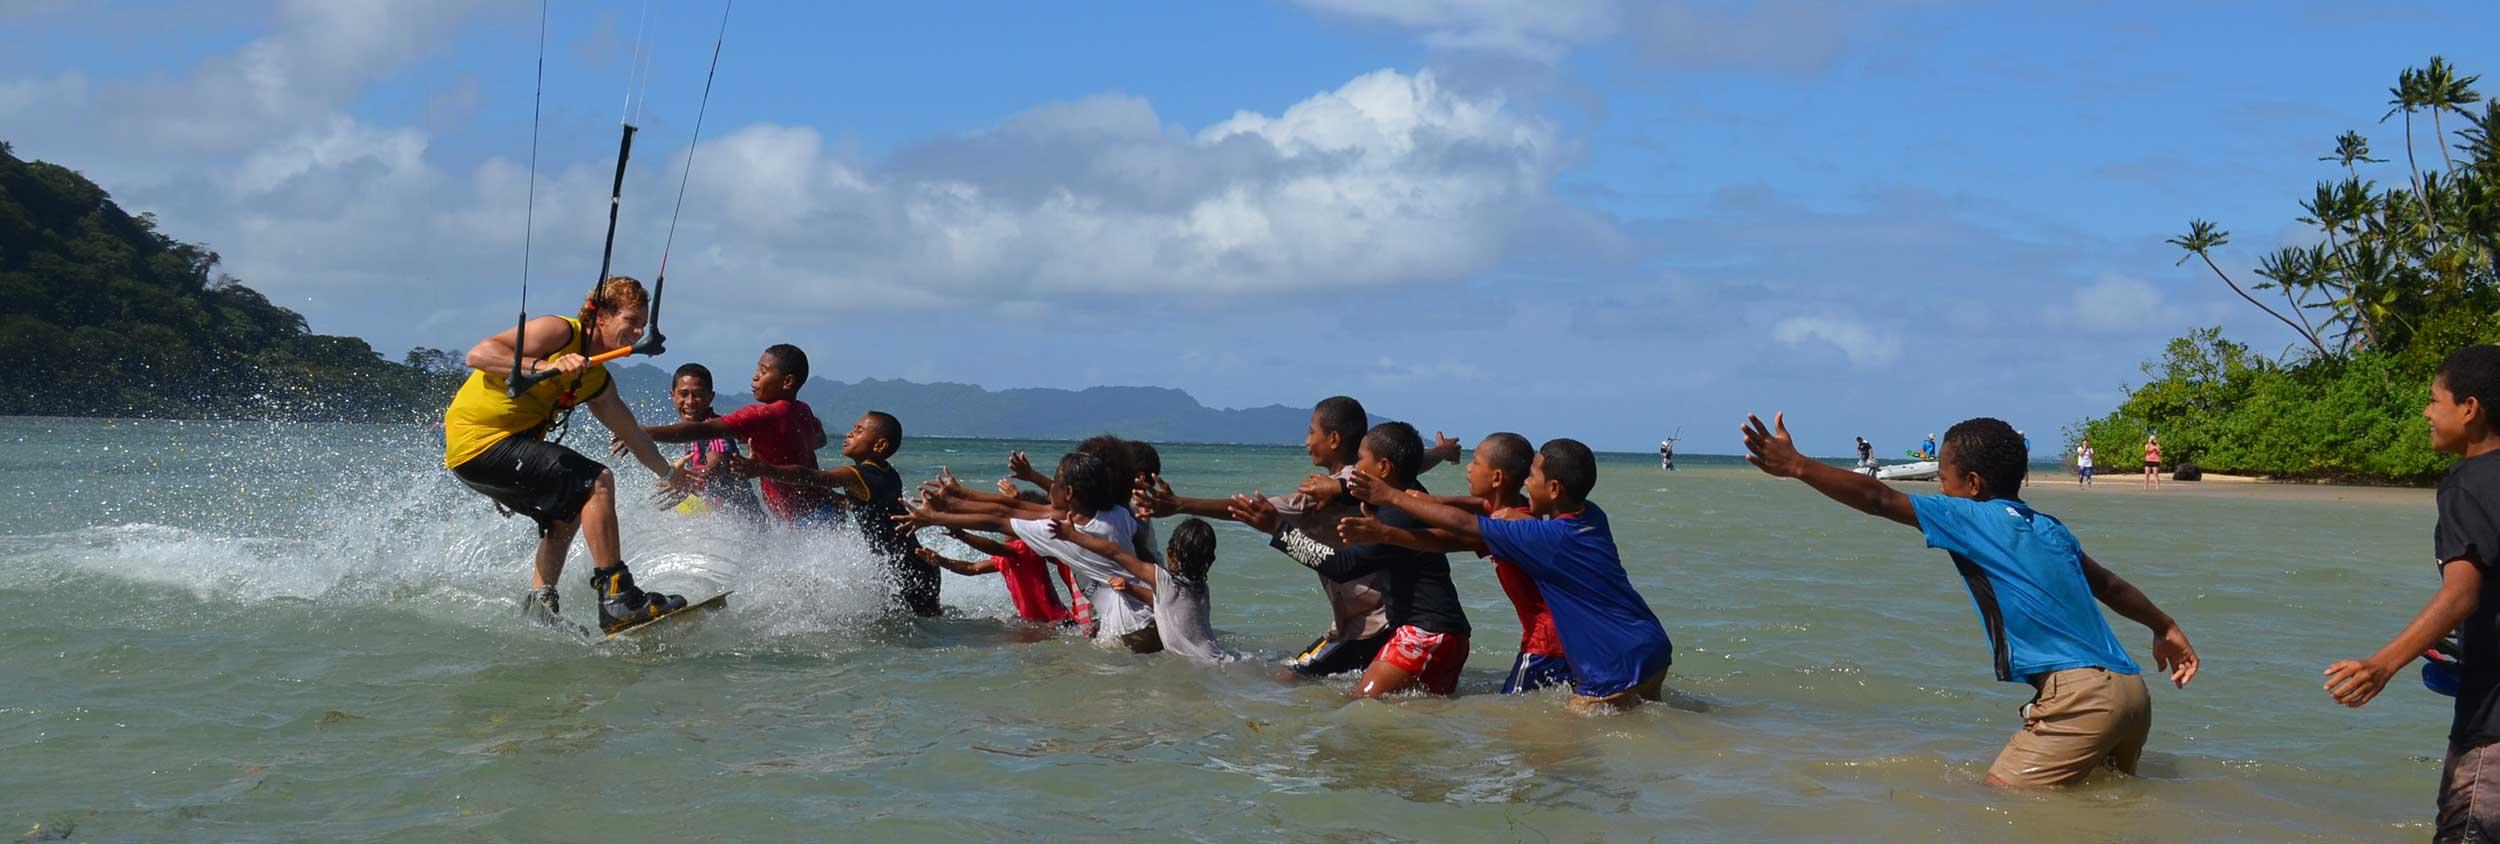 Taveuni Island Fiji Kiteworld travel kitesurfing